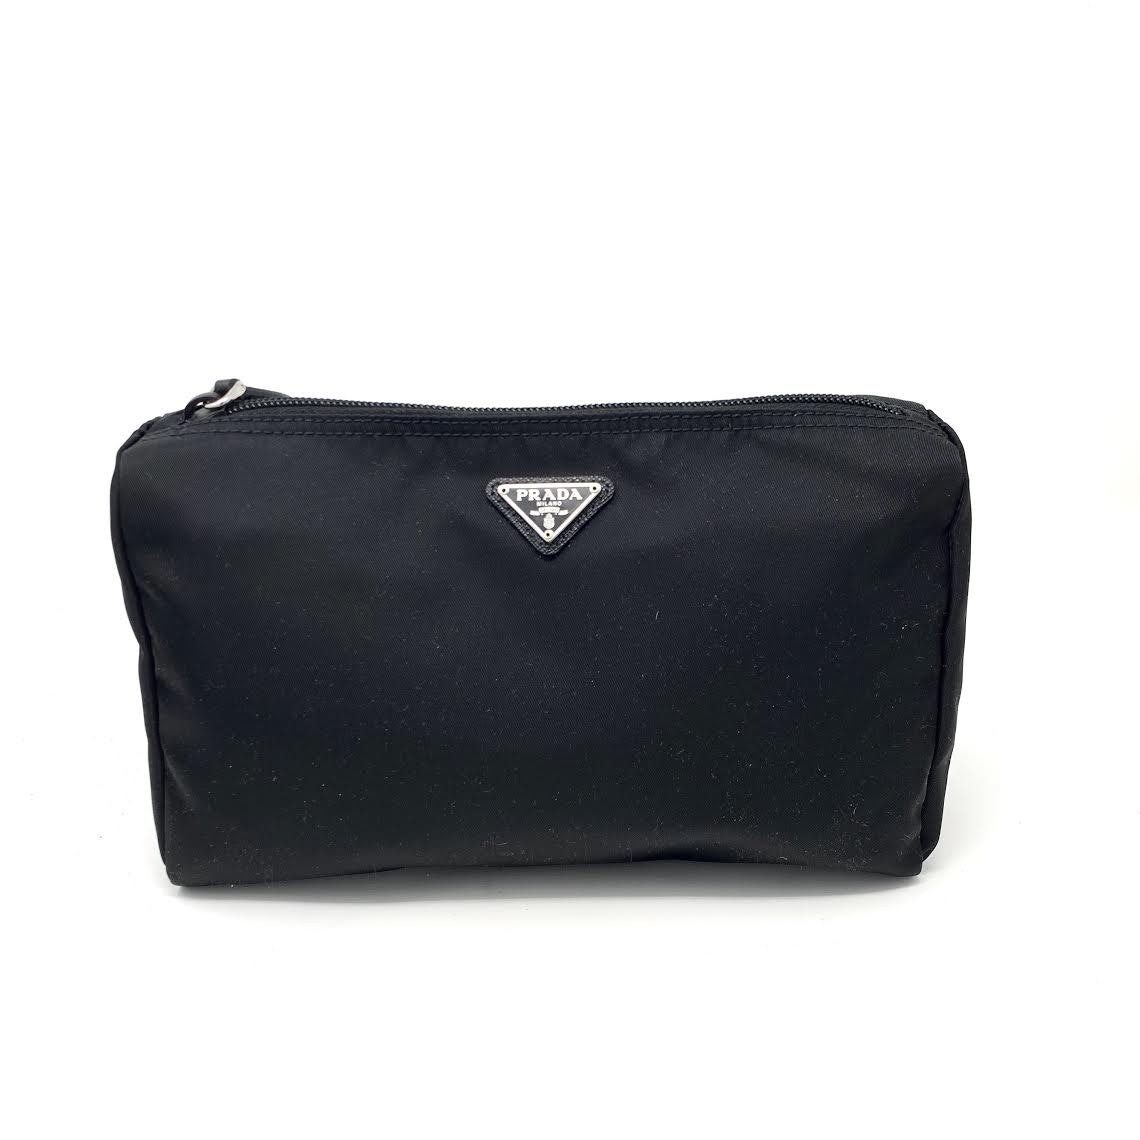 Prada Cosmetic Case Nylon Black